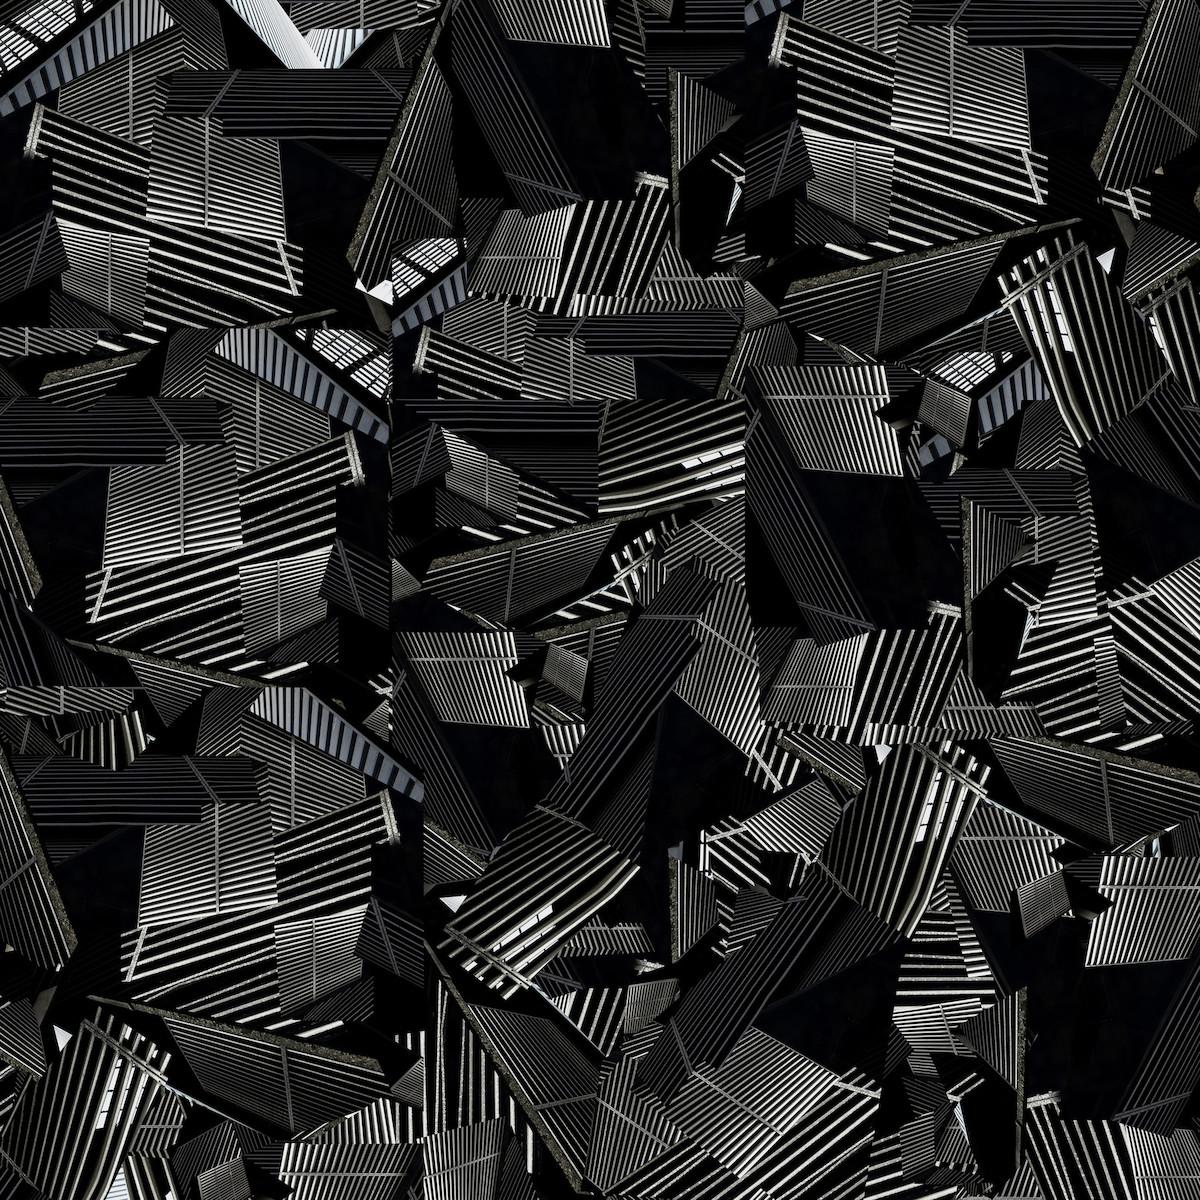 Steve Sabella - Metamorphosis, 2012 - Contemporary Art Platform, Koweit